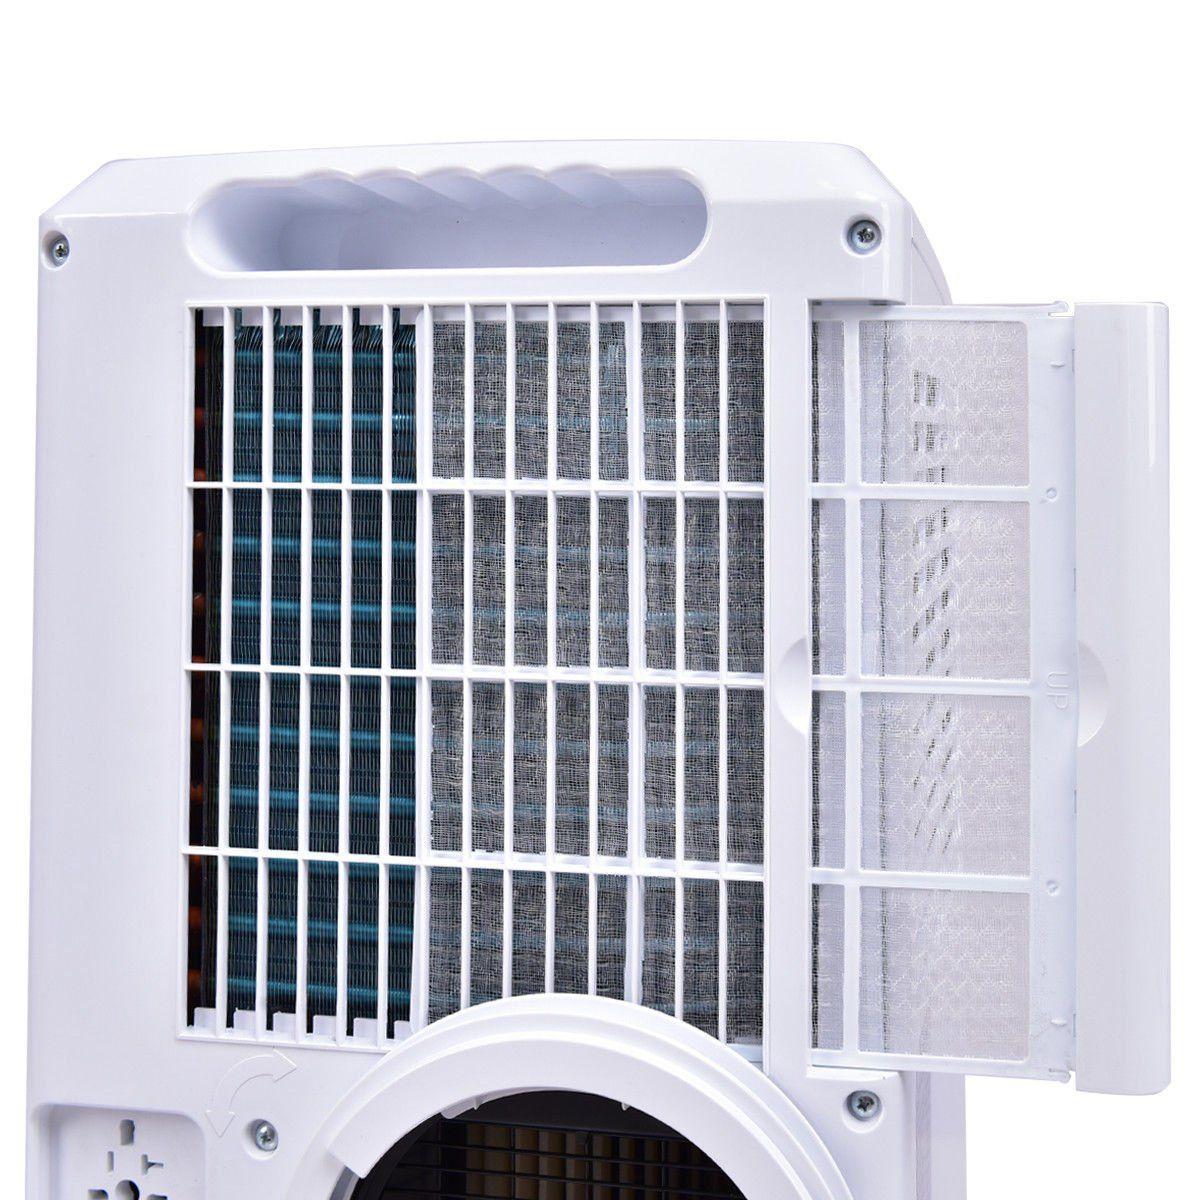 Costway 10000 Btu Portable Air Conditioner With Remote Control Dehumidifier Function Window Wall Mount W Portable Air Conditioner Air Conditioner Dehumidifiers